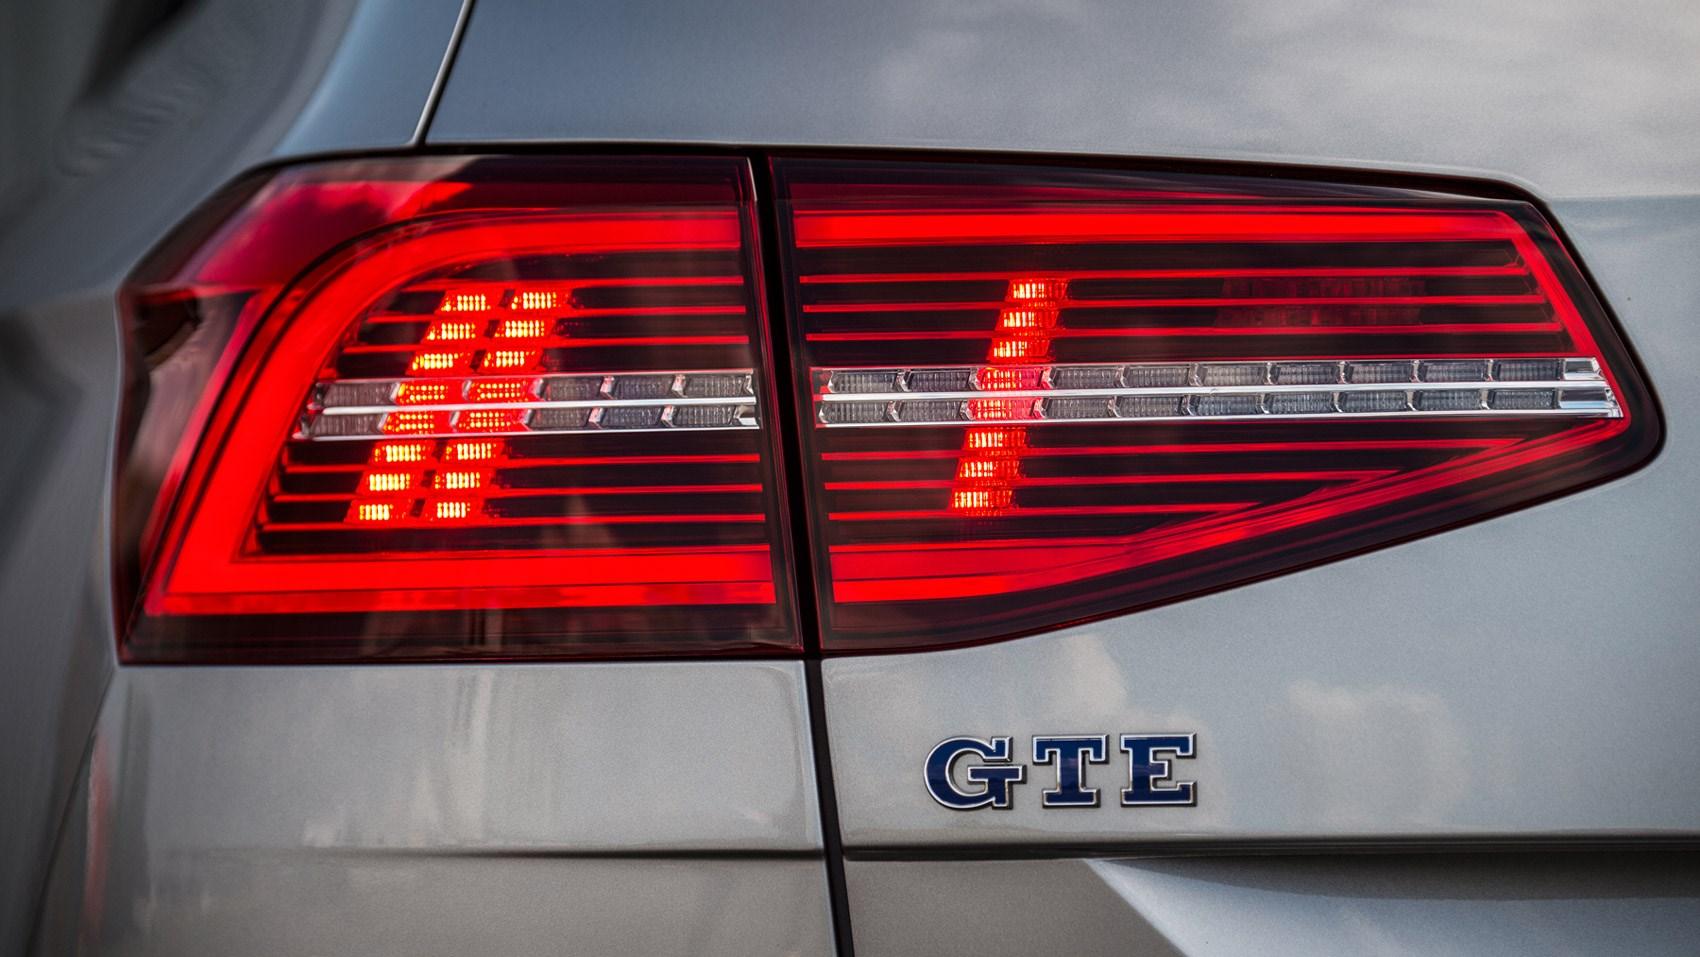 Volkswagen passat review 2017 autocar -  Gte Joins Gti And Gtd In Volkswagen Hierarchy